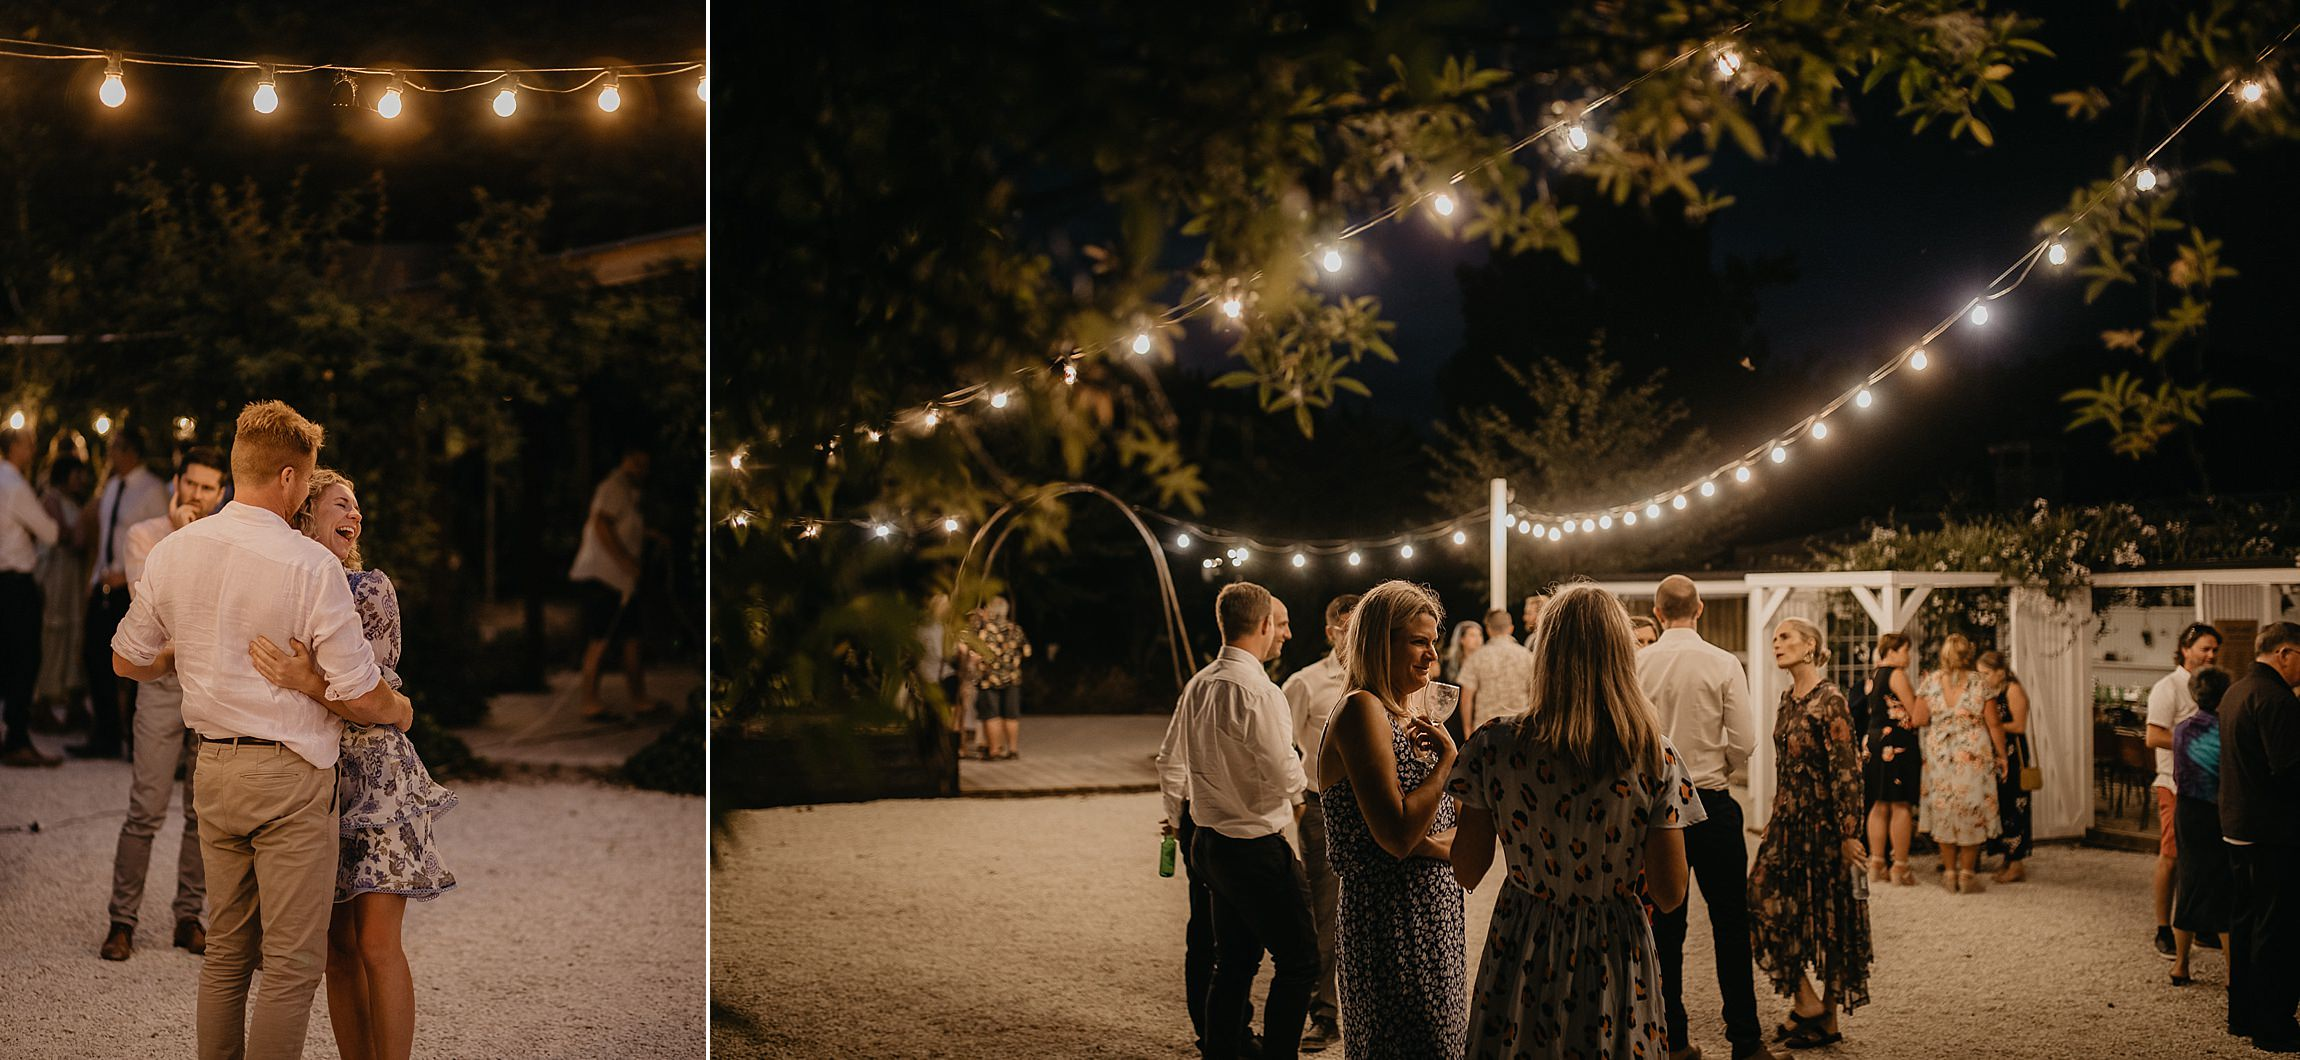 oldforestschool-wedding-blog-197.jpg